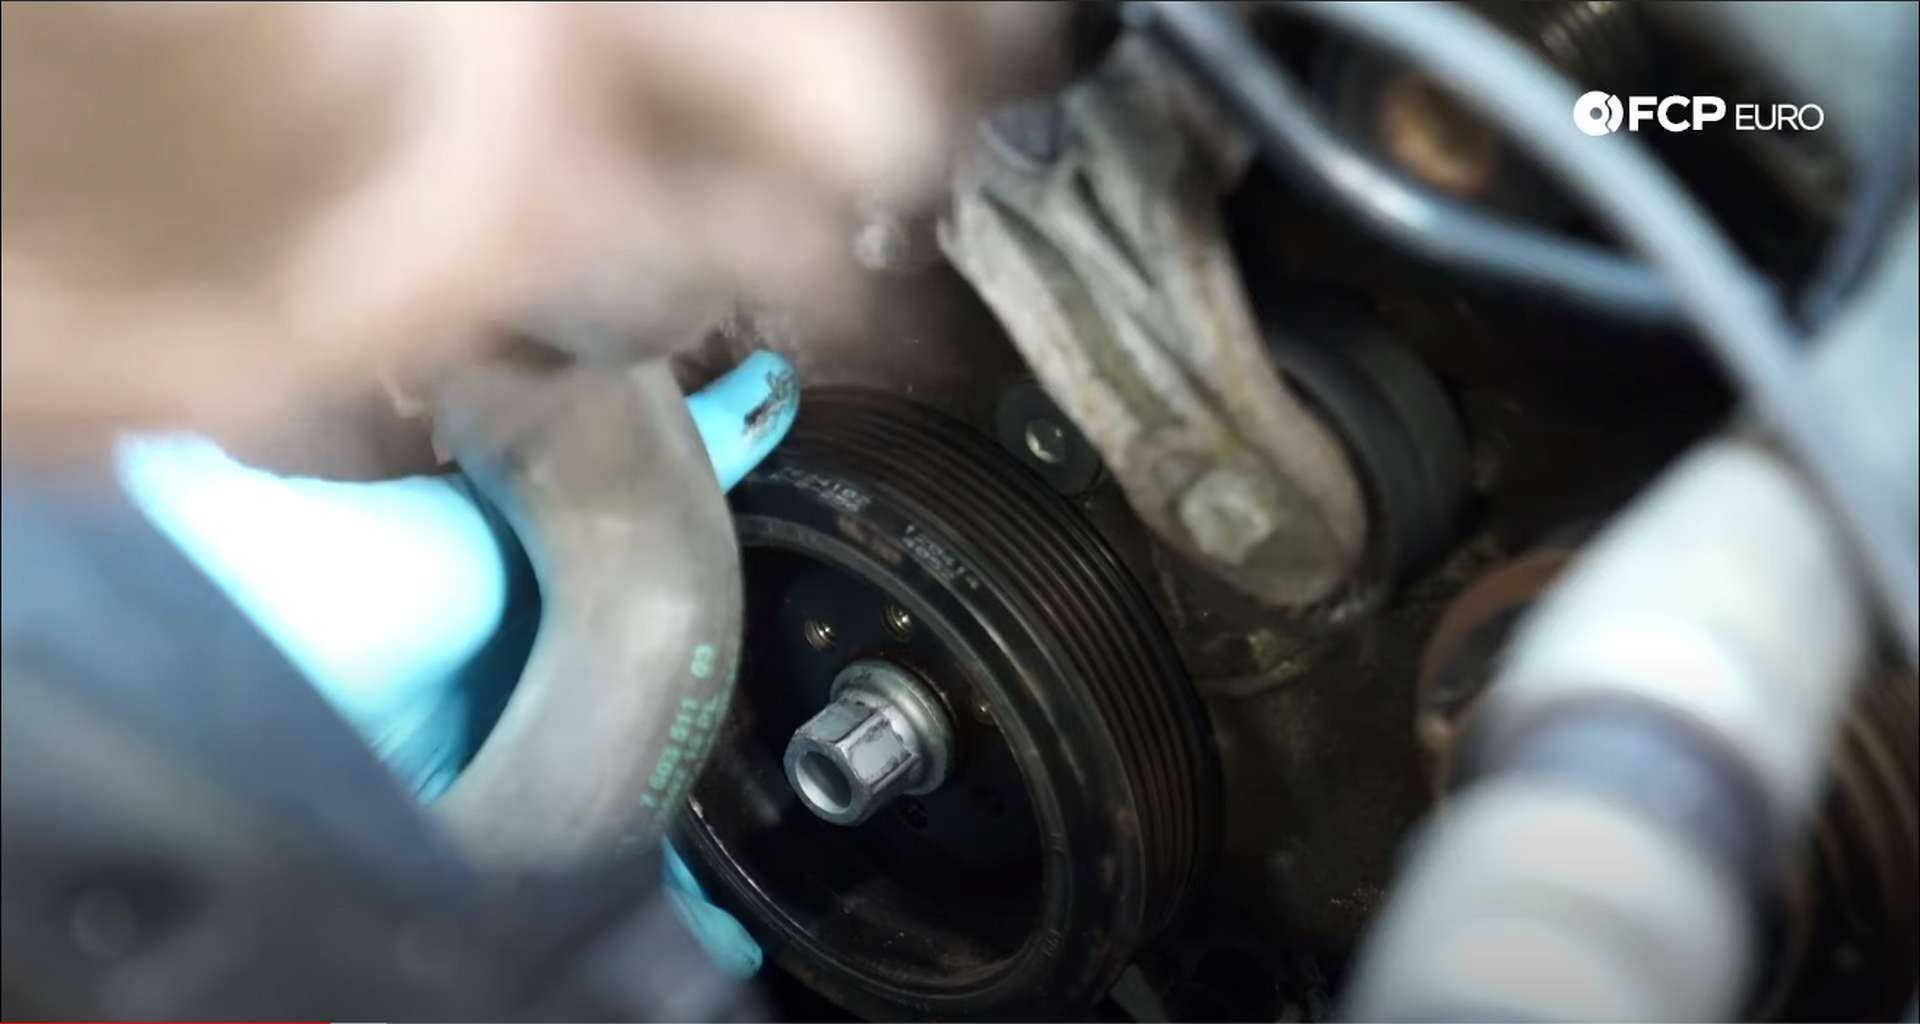 DIY BMW N20 Timing Chain installing the vibration dampener